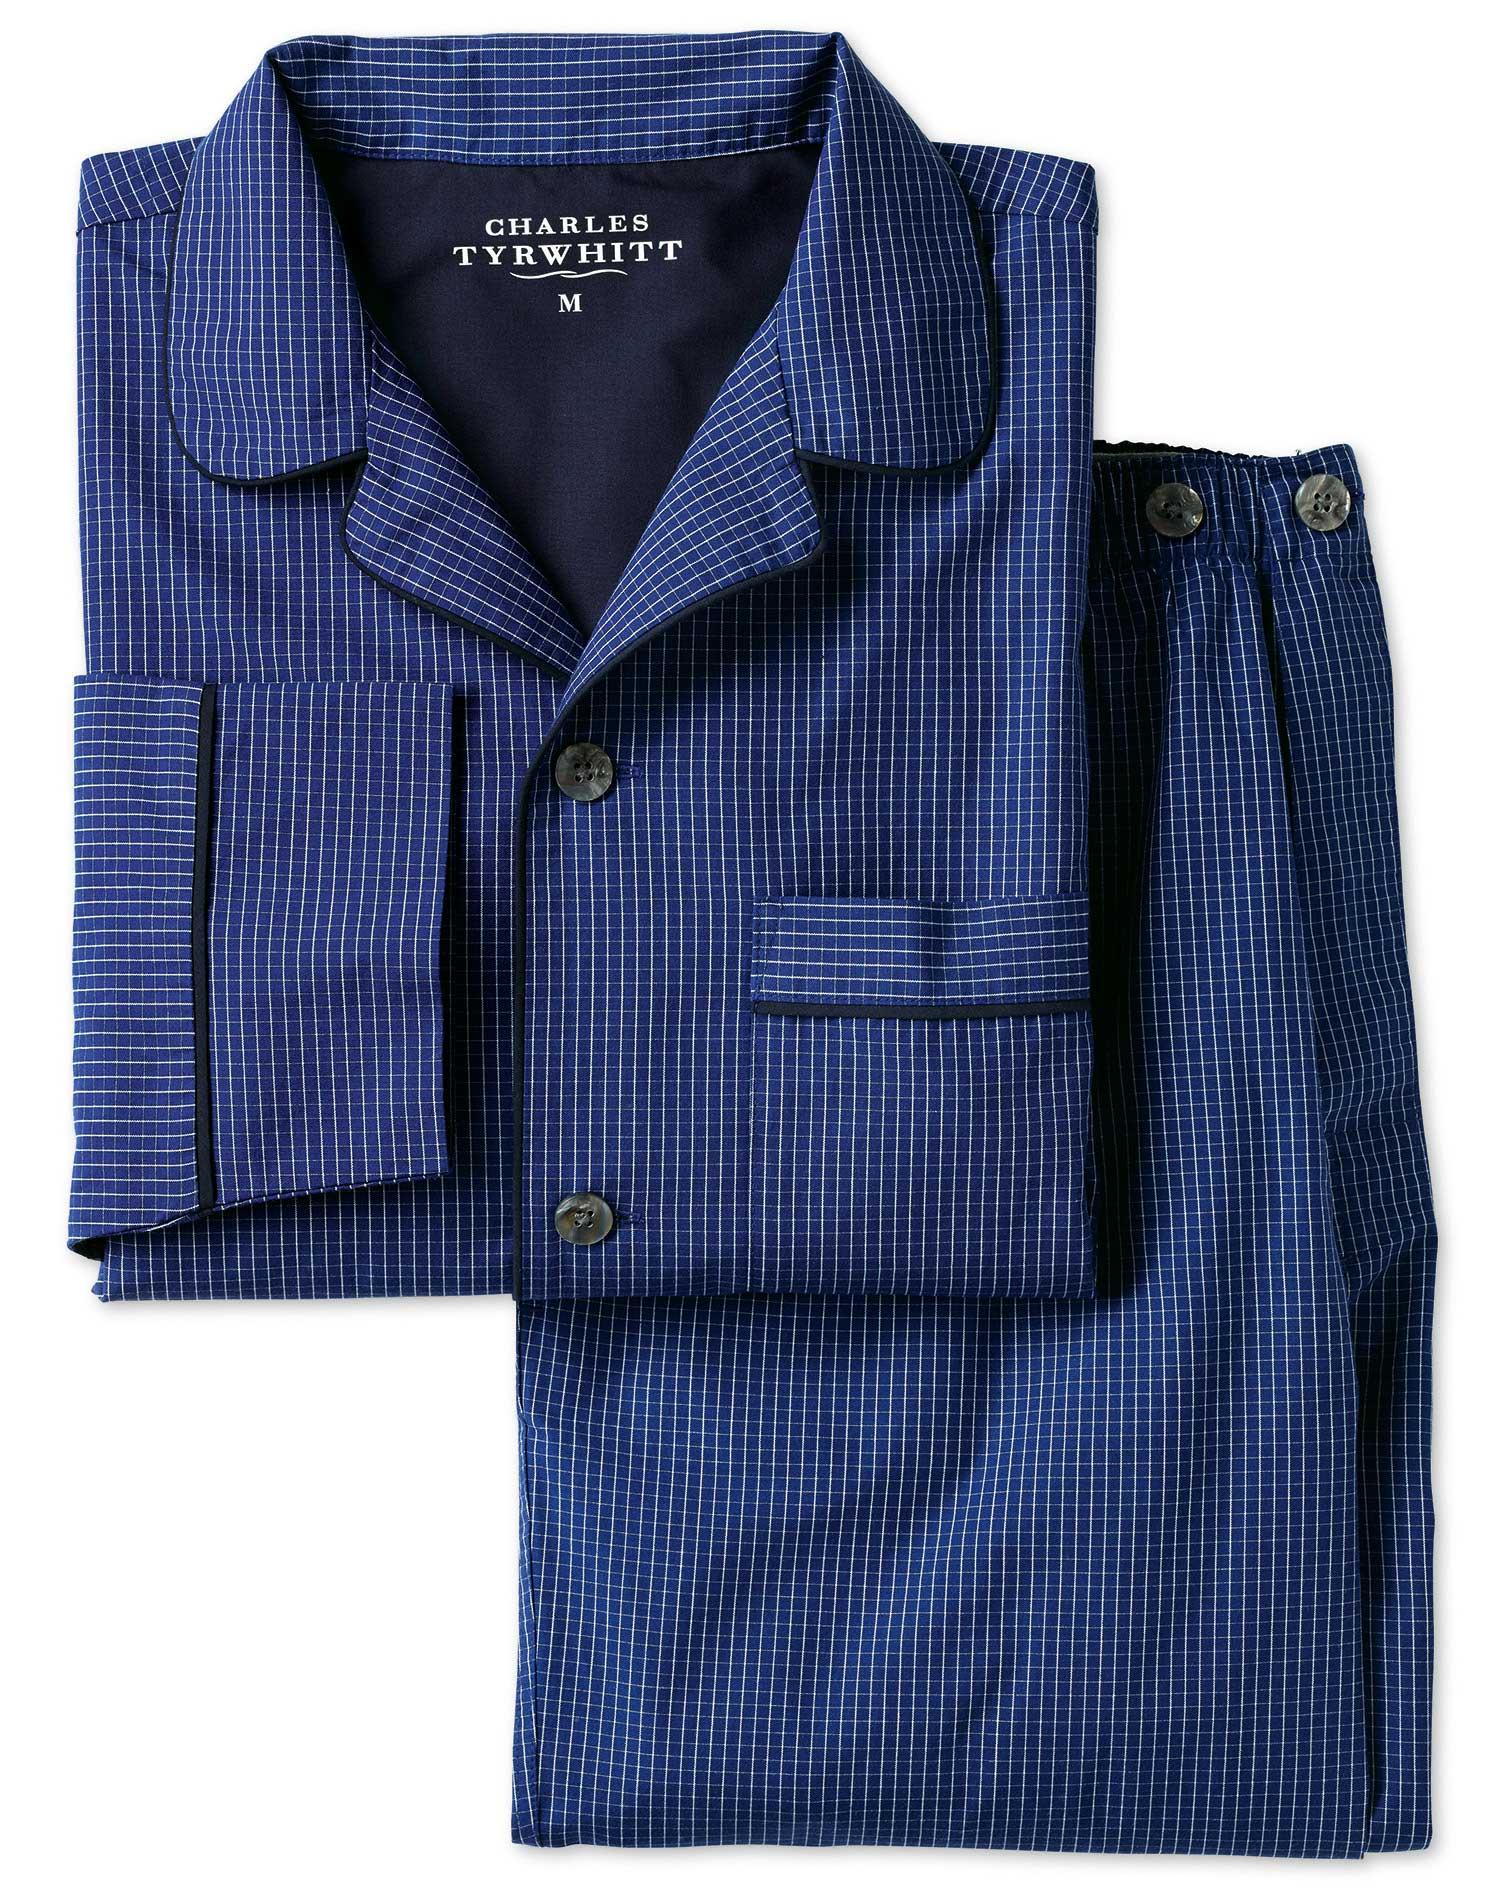 Blue Windowpane Check Pyjama Set Size XXL by Charles Tyrwhitt